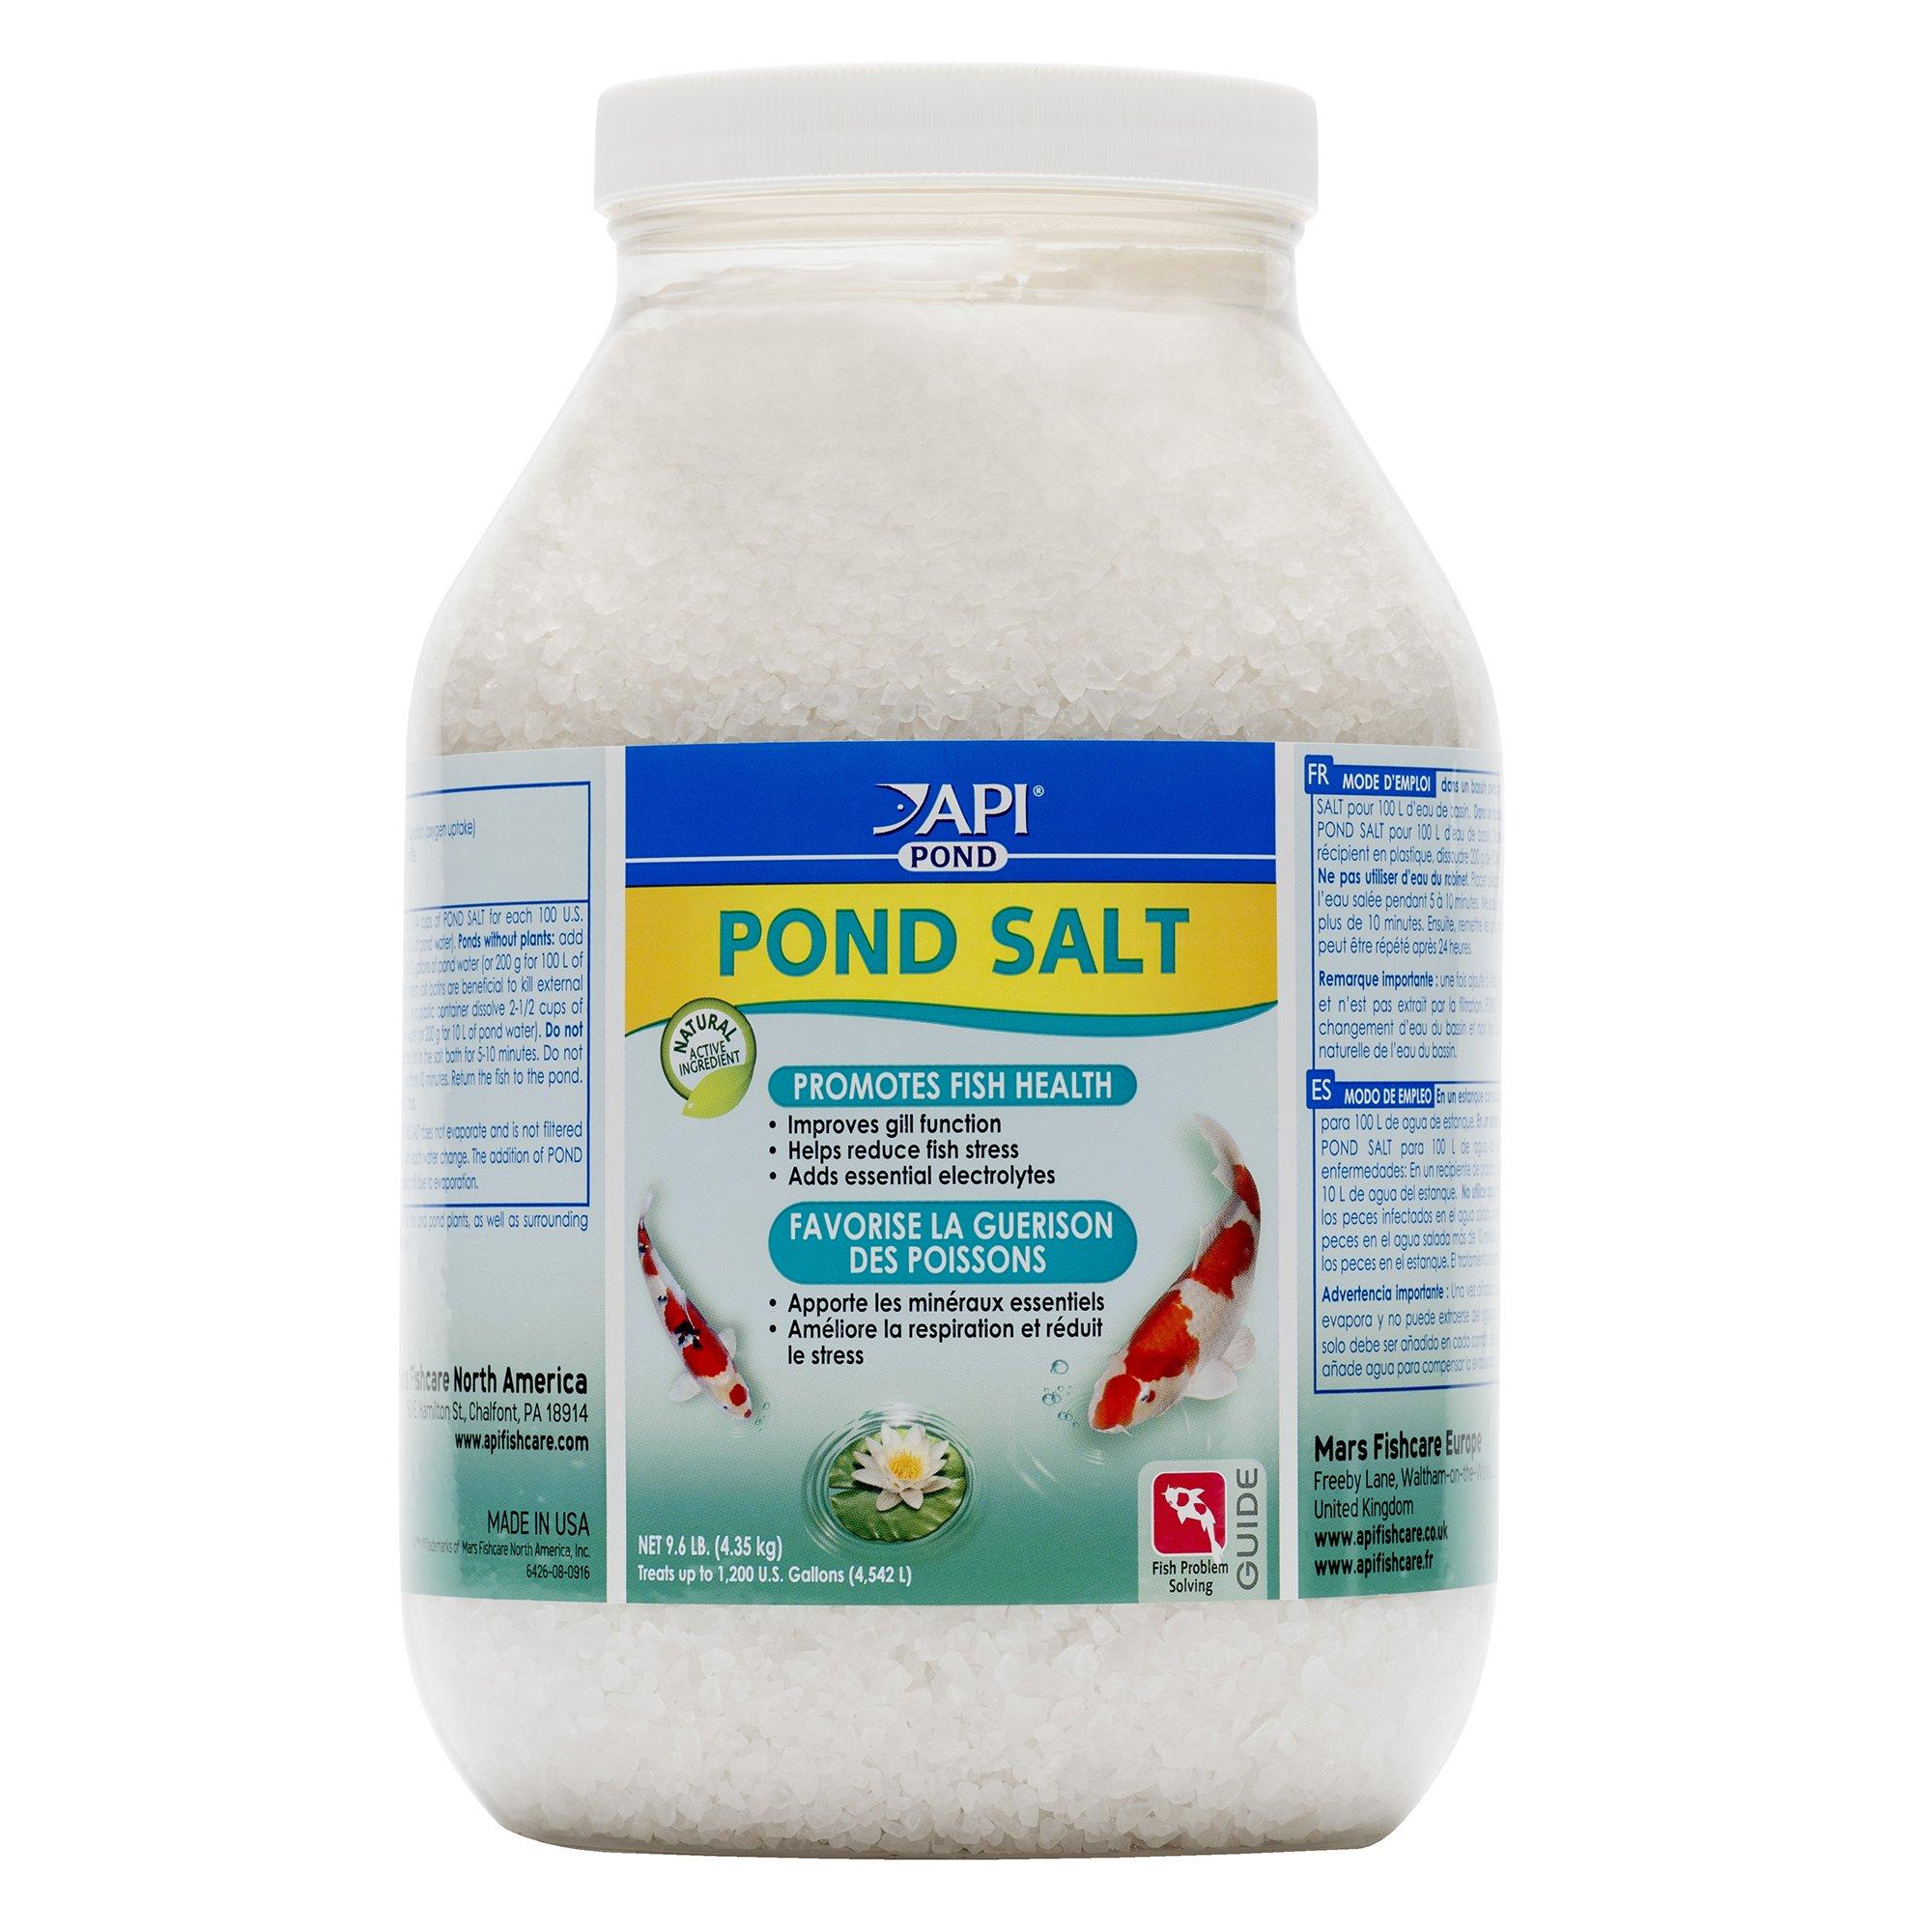 API POND SALT Pond Water Salt 9.6-Pound Container by API